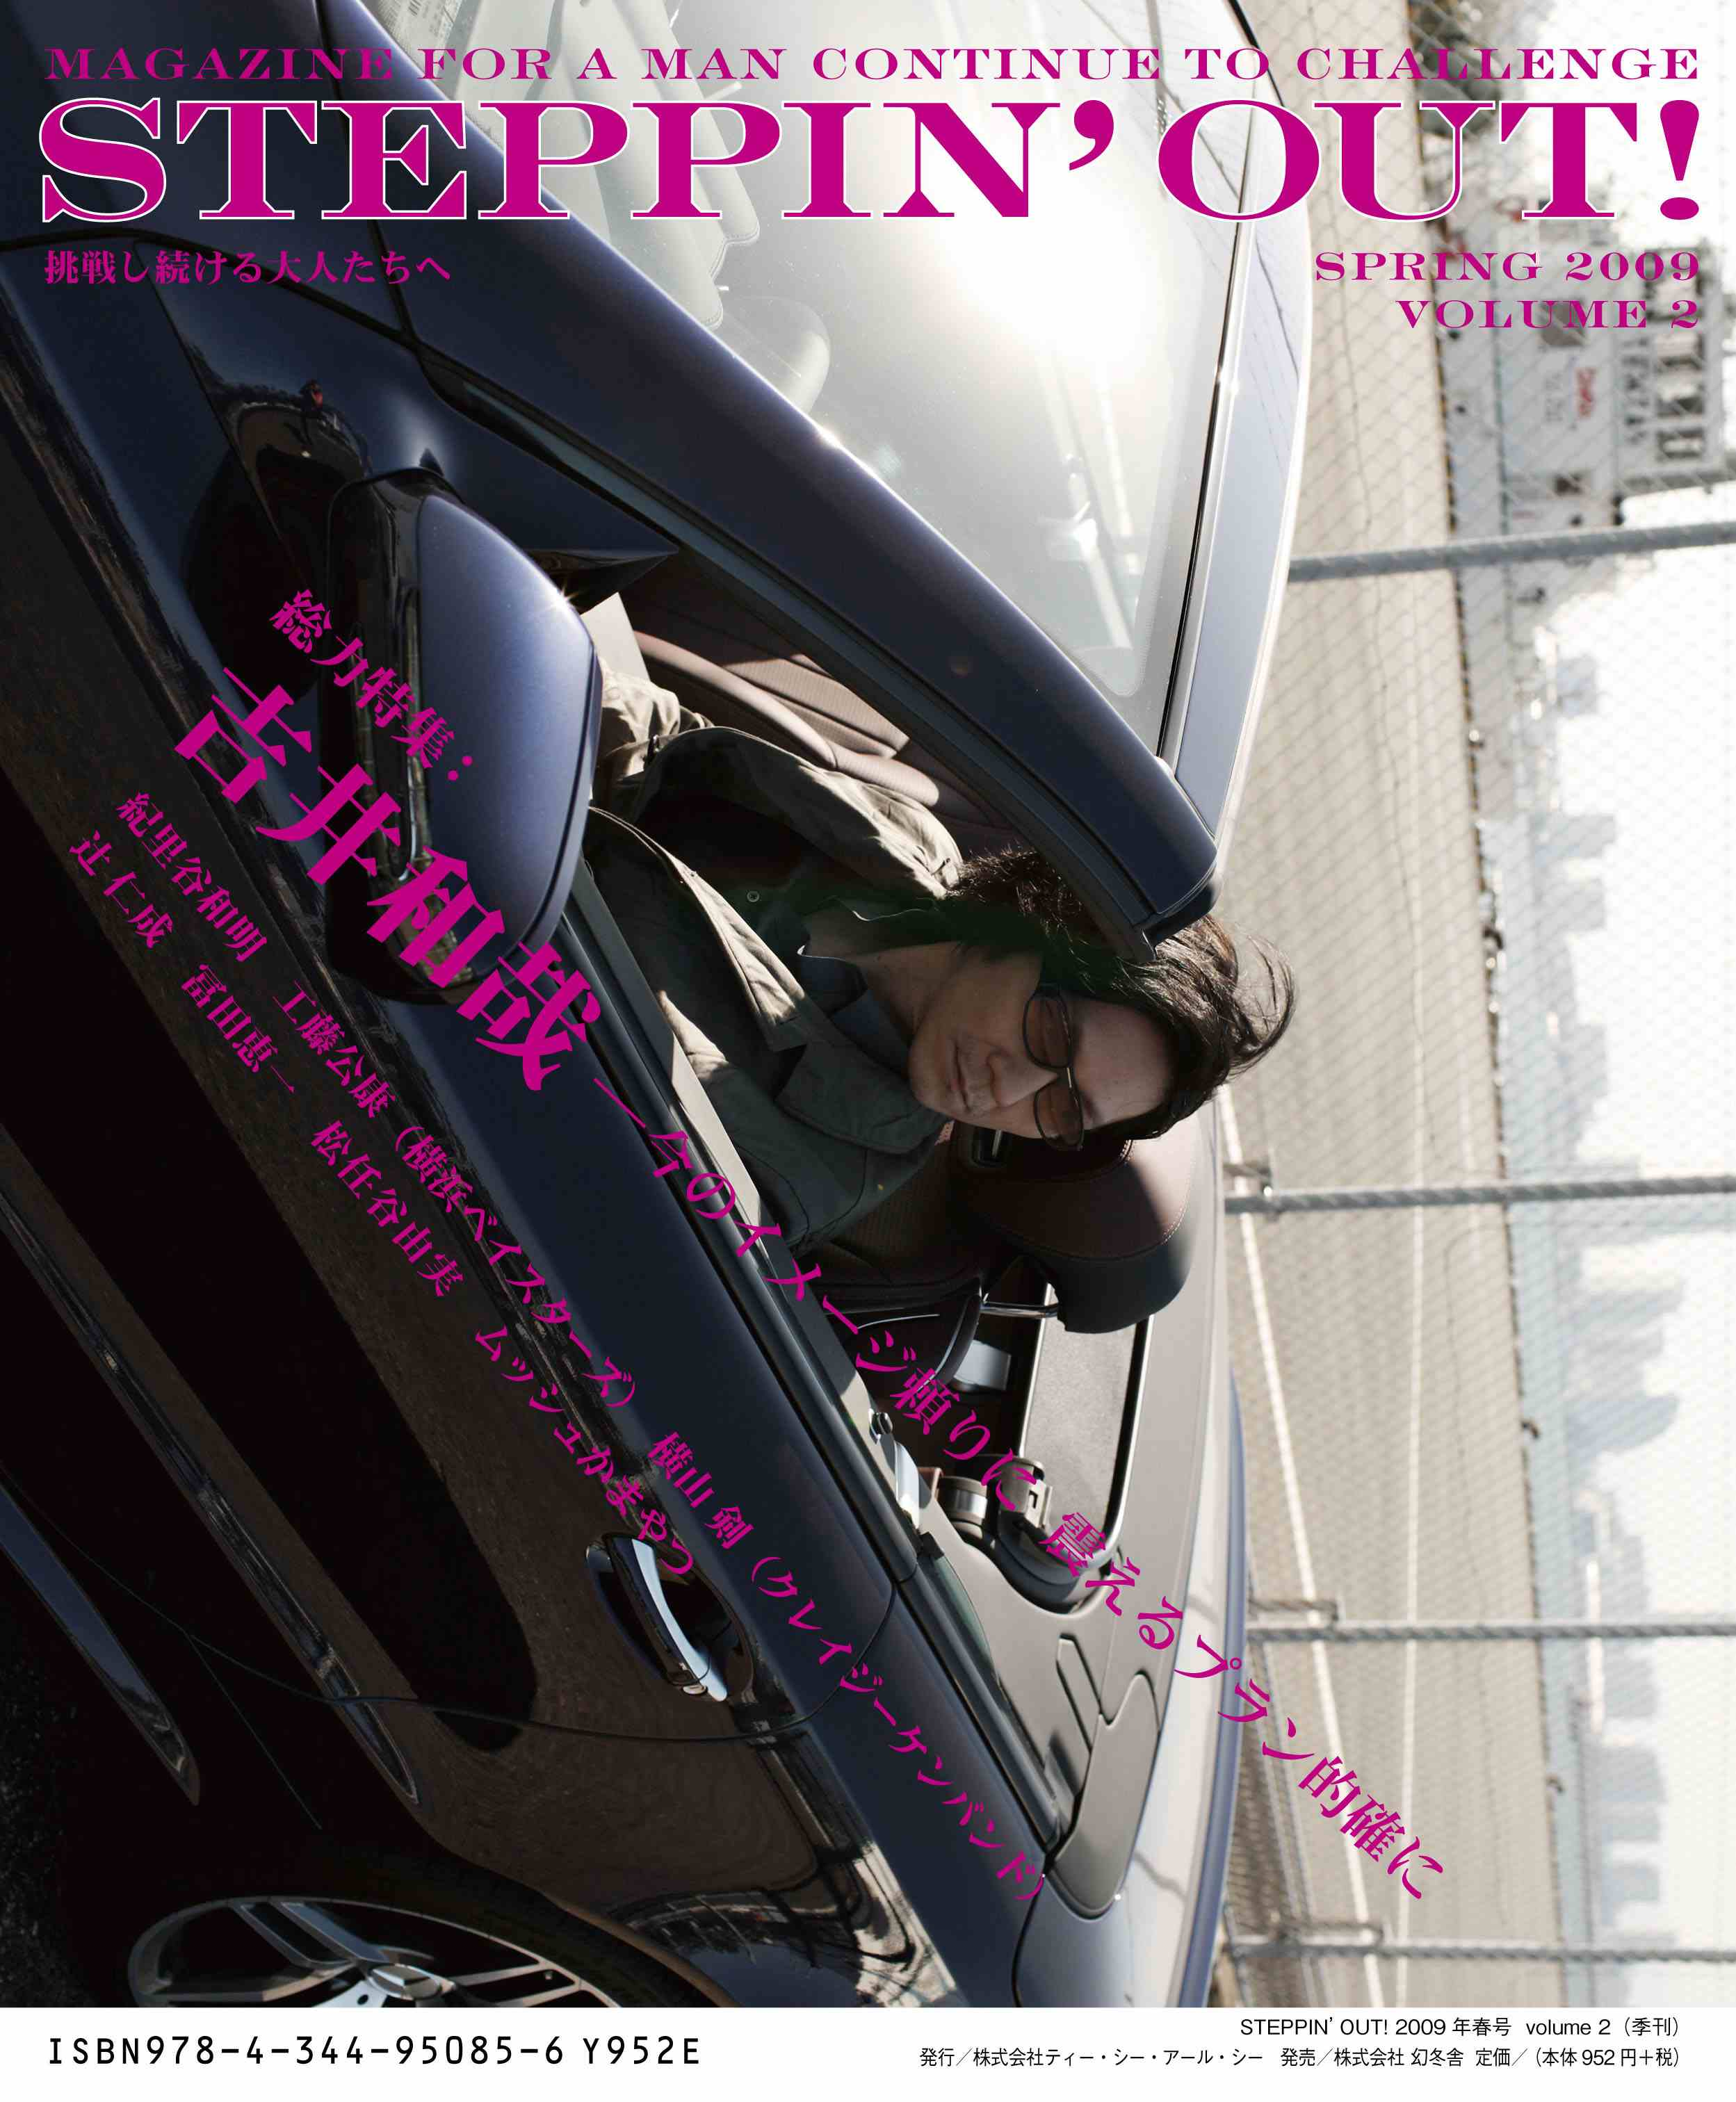 4/28『STEPPIN\' OUT!』Vol.2リリースです!_f0120018_1153340.jpg